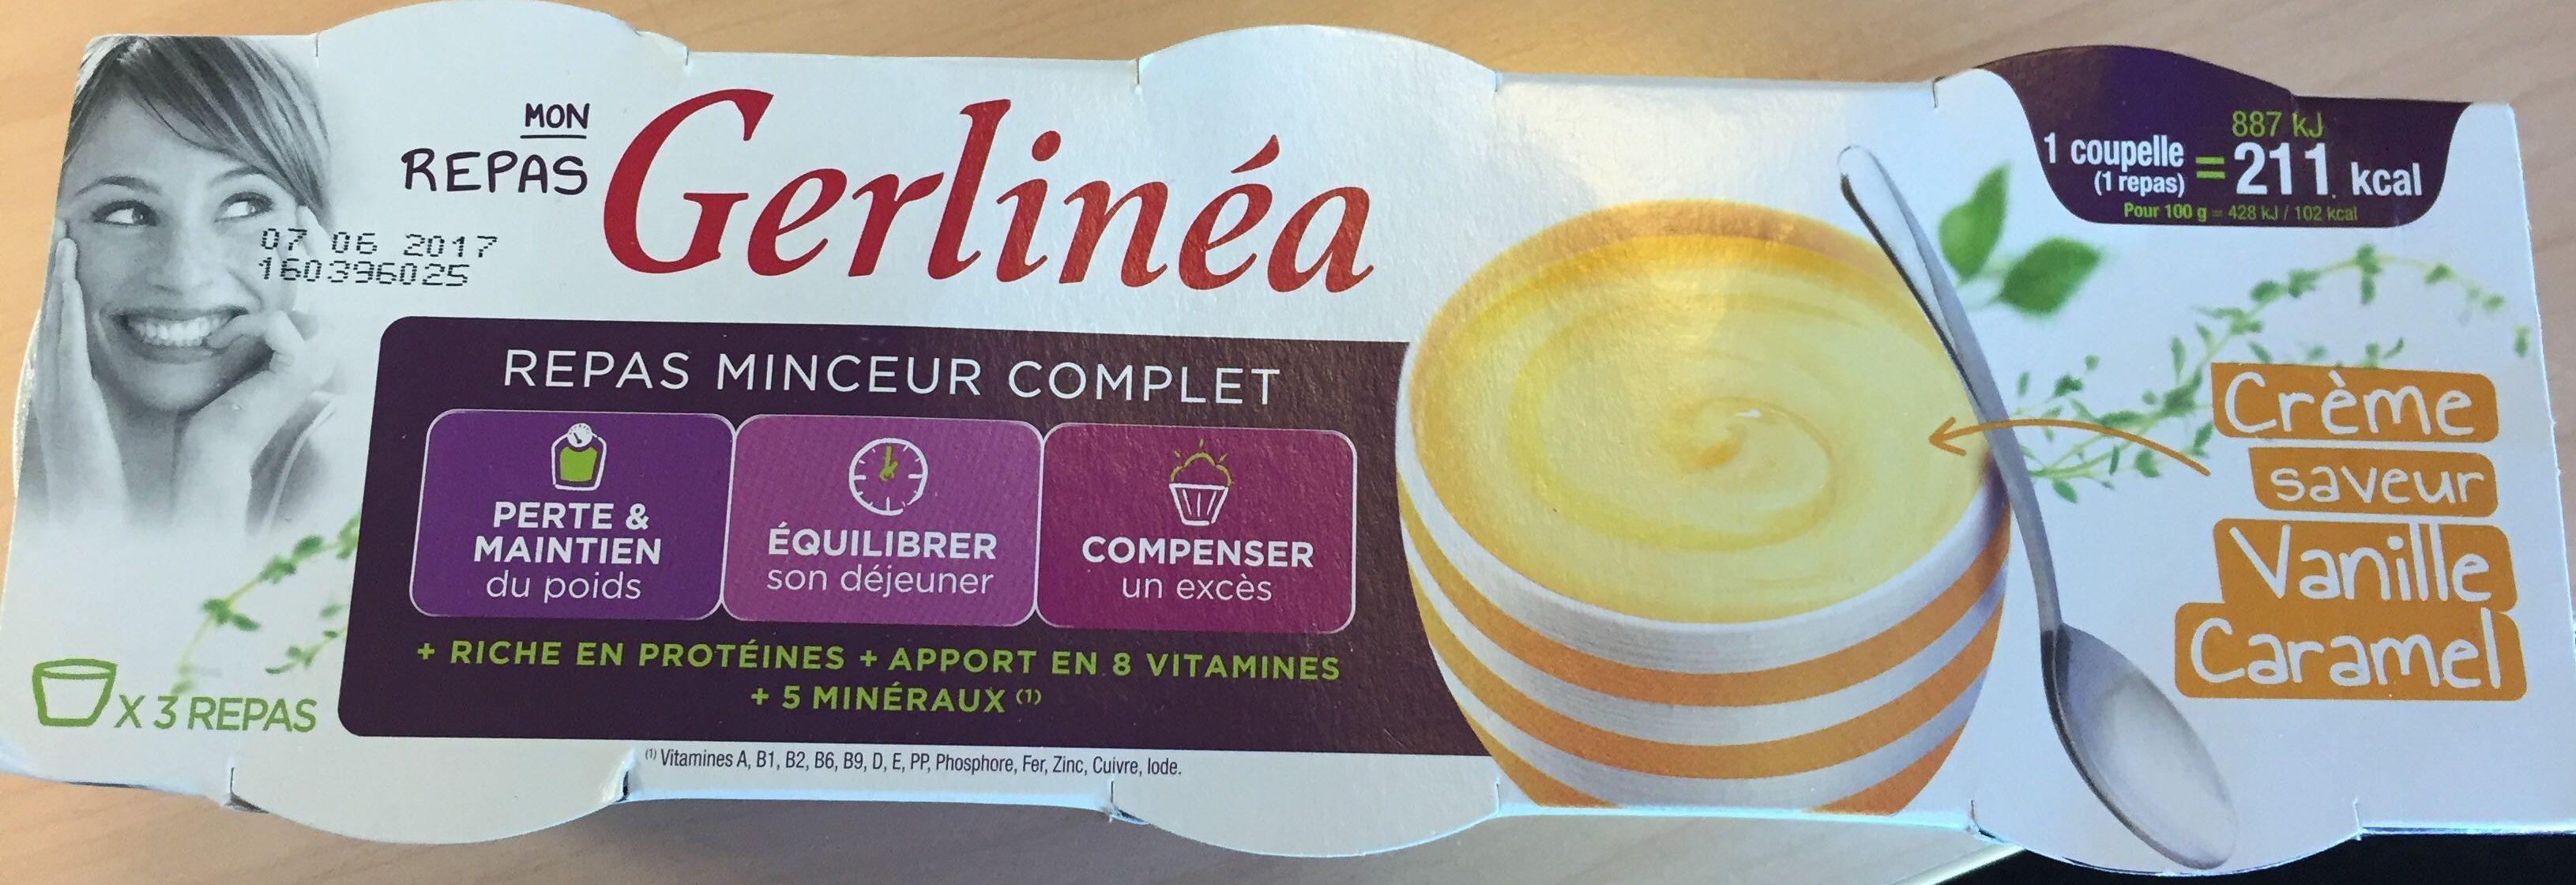 Repas saveur vanille caramel - Produit - fr